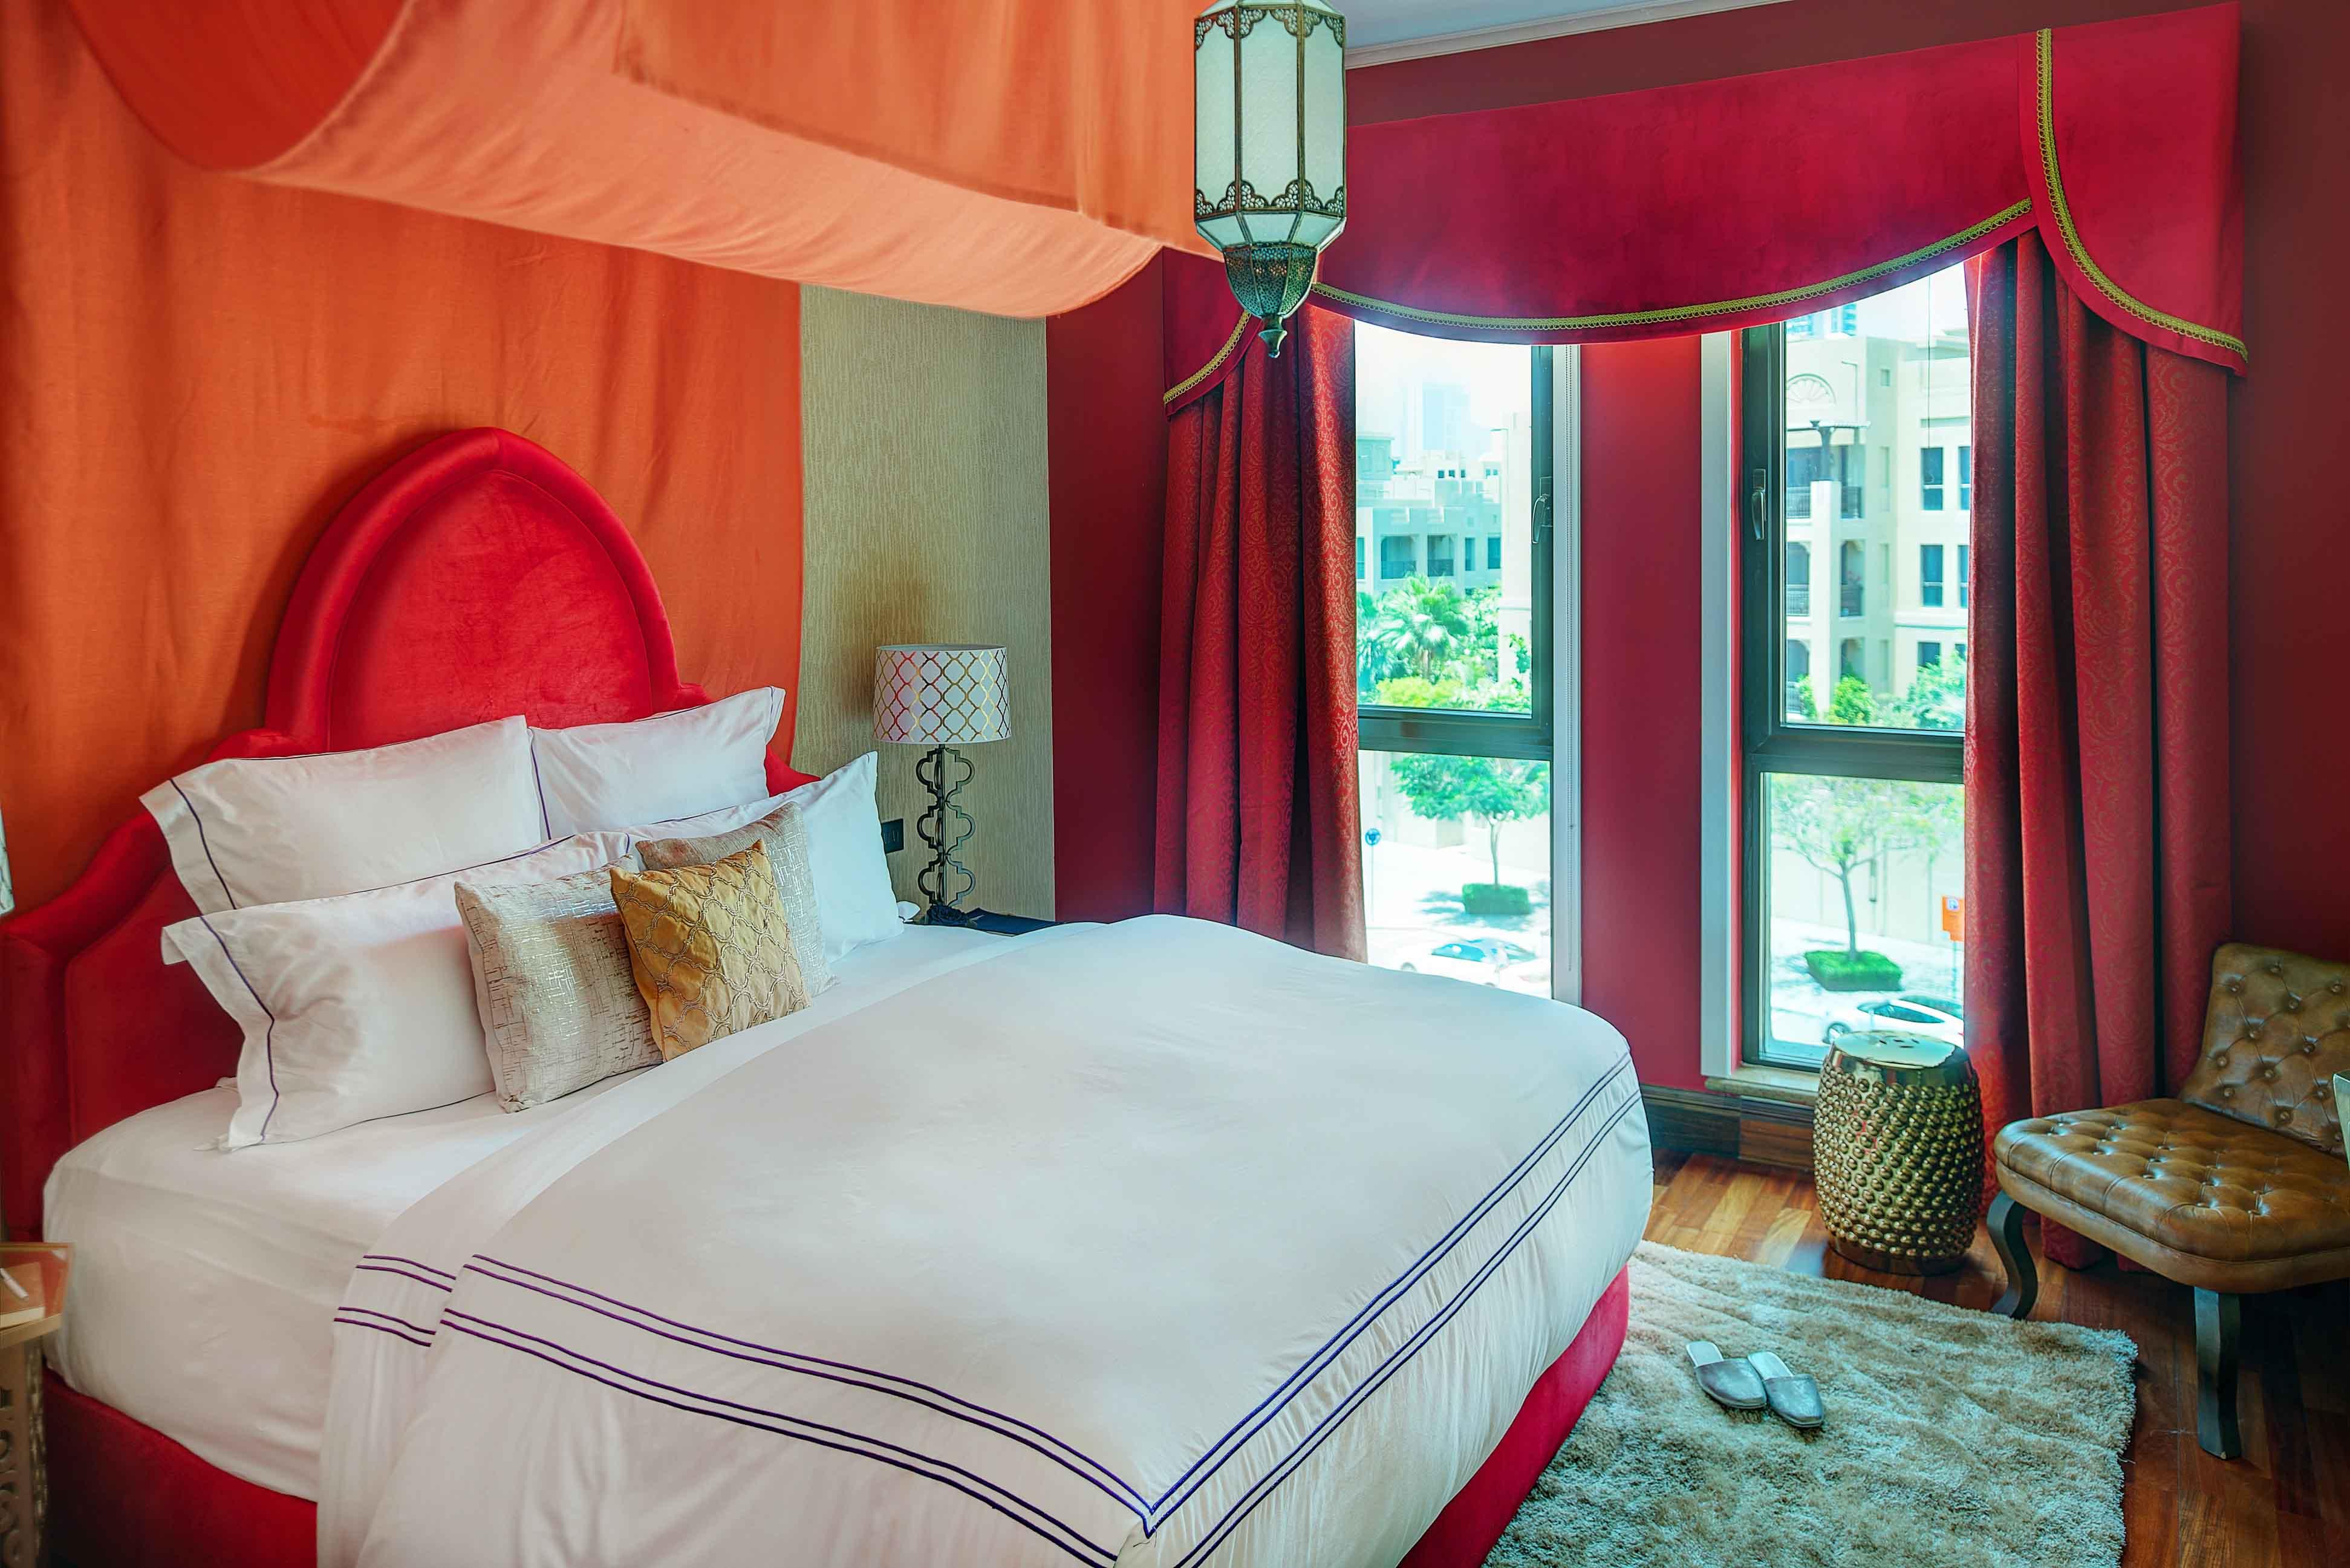 Bedroom at Emaar Miska Tower Apartment